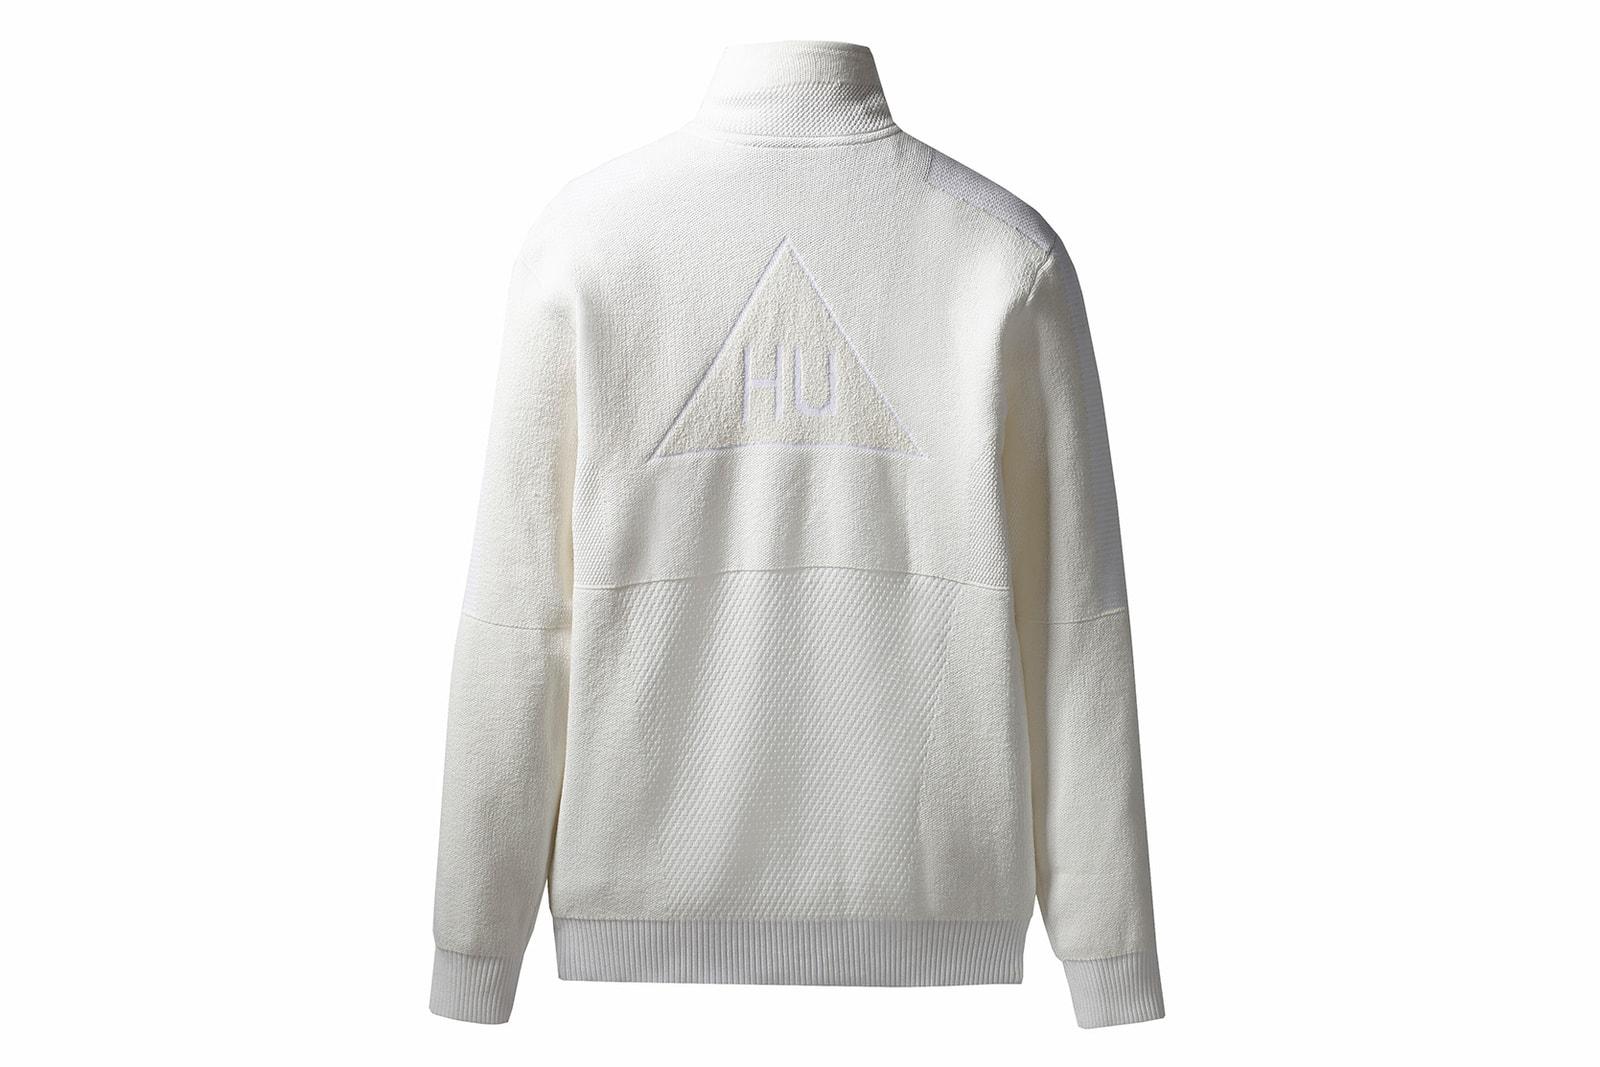 Supreme Spring/Summer 2018 Drop 1 Second Release Info Aimé Leon Dore ALYX Pharrell adidas originals moncler craig green mackintosh patta neighborhood